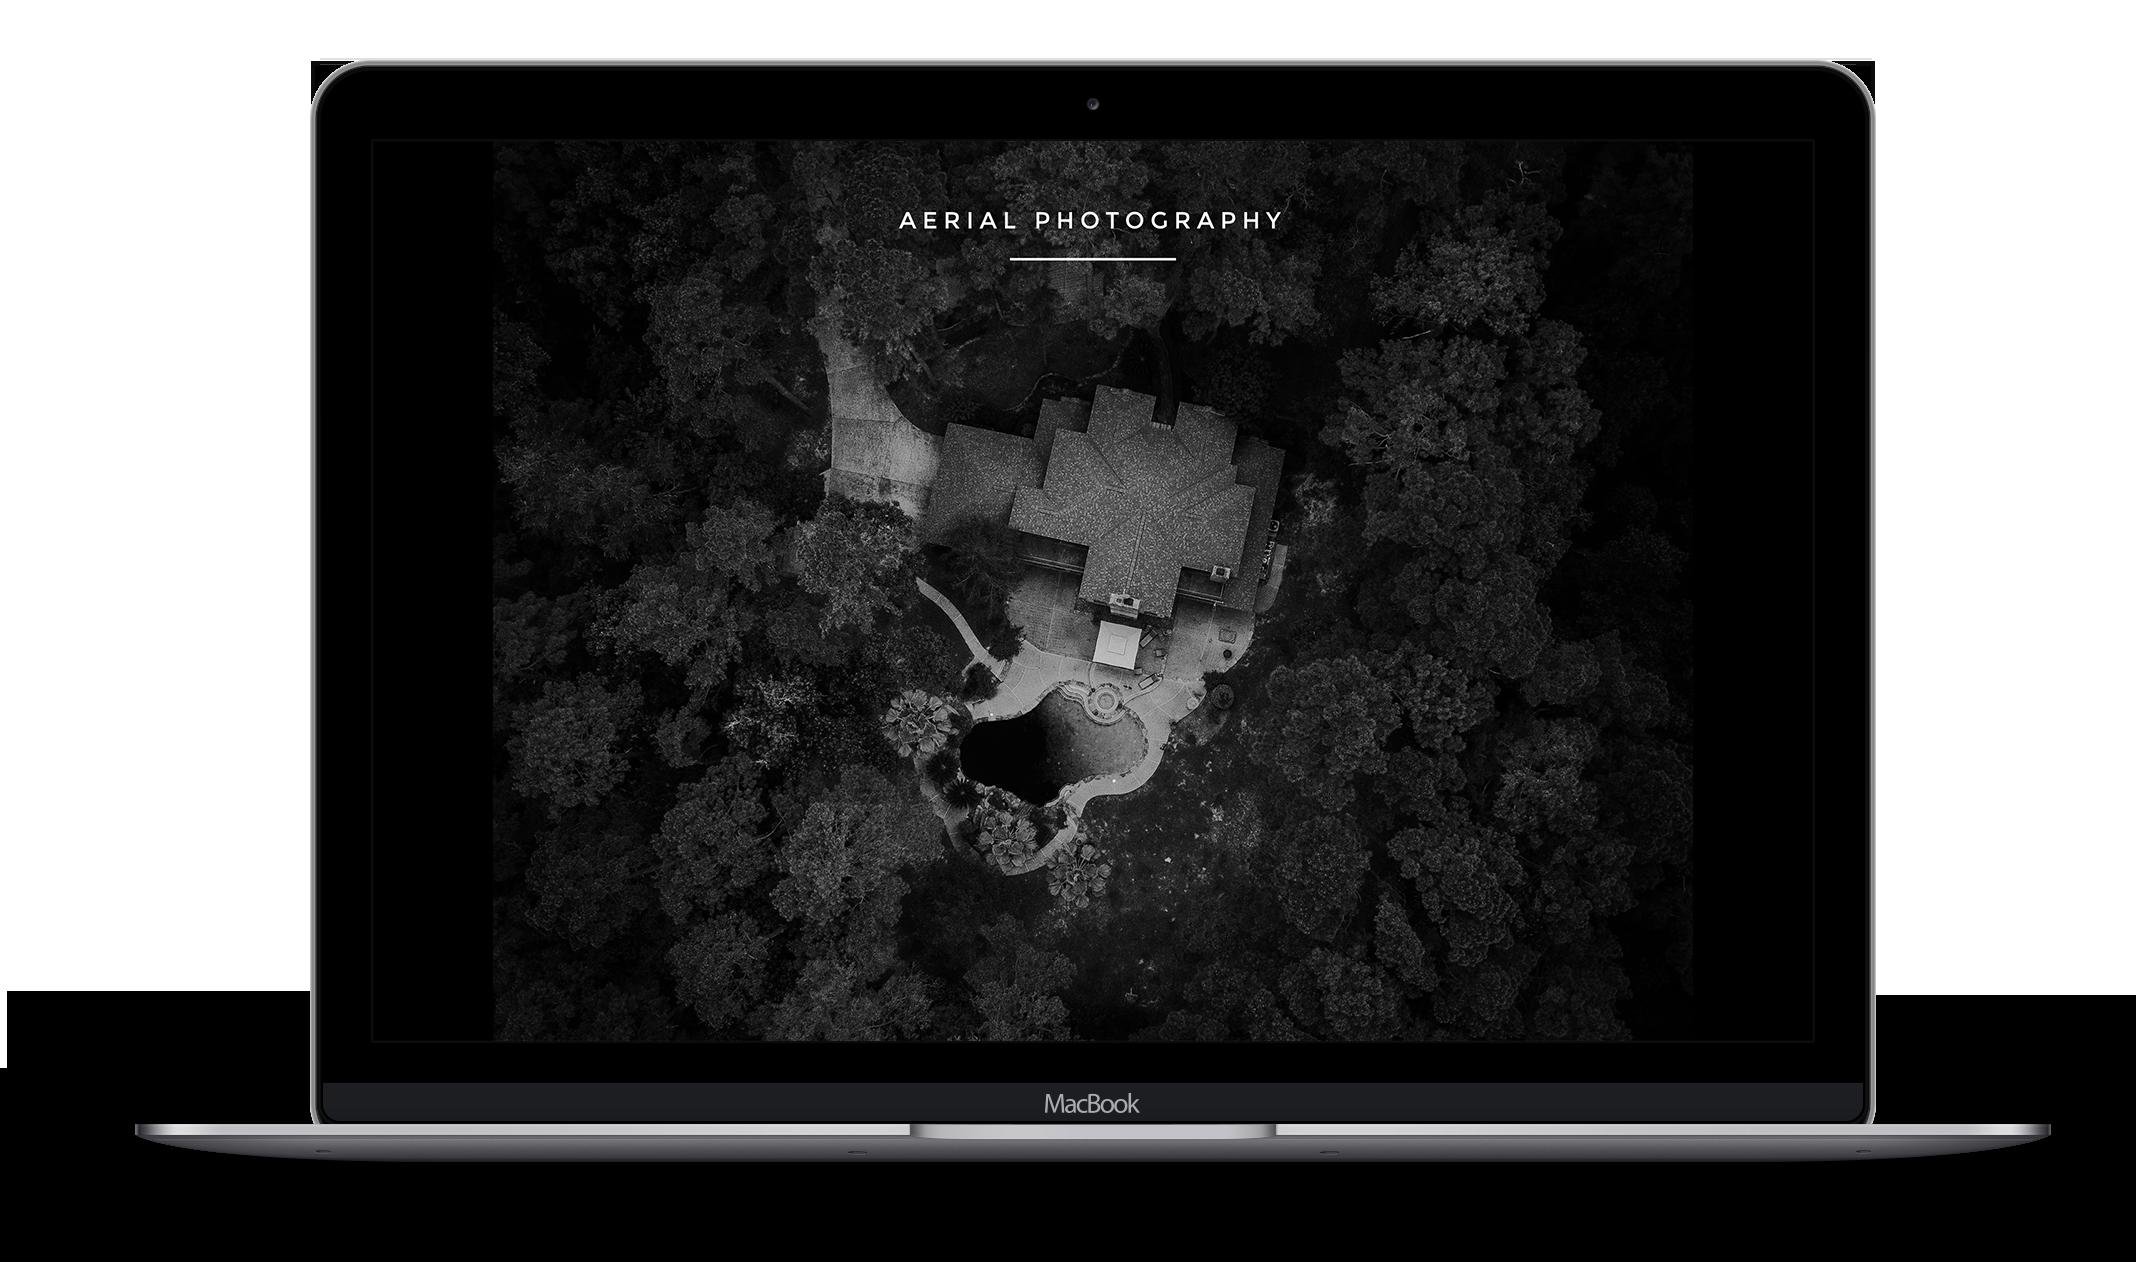 Nick-Presentation-5-Macbook-Mockup.png